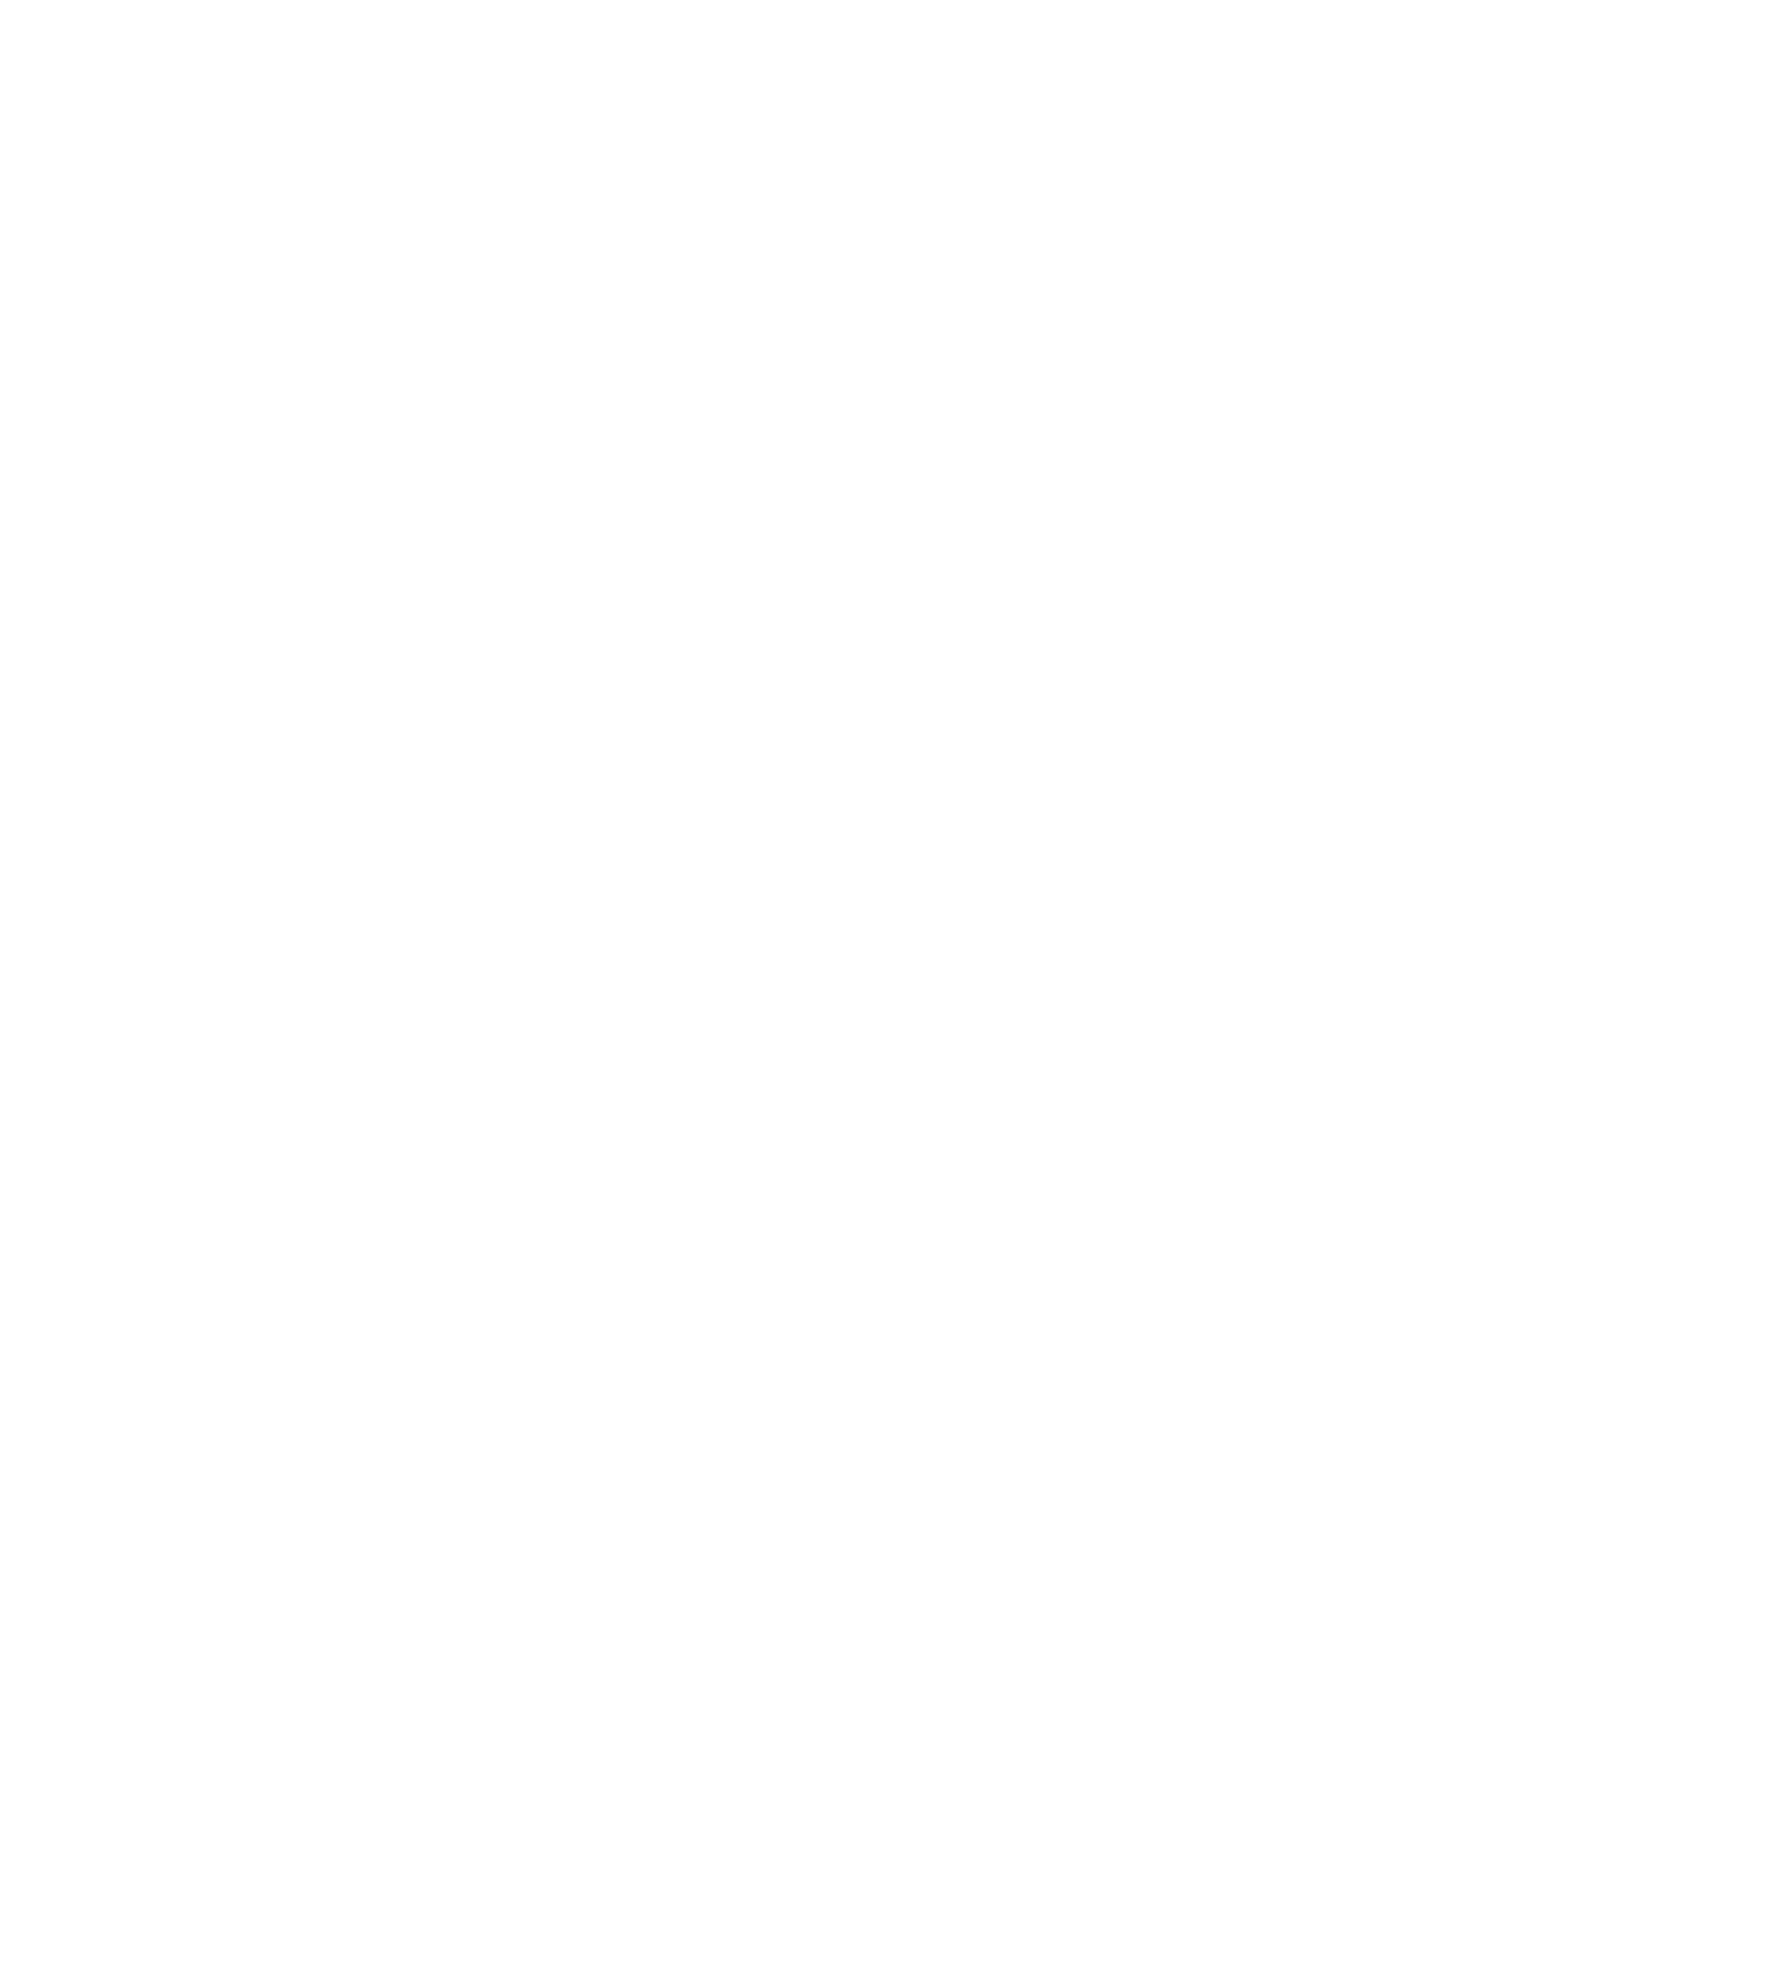 Interior Racing Association